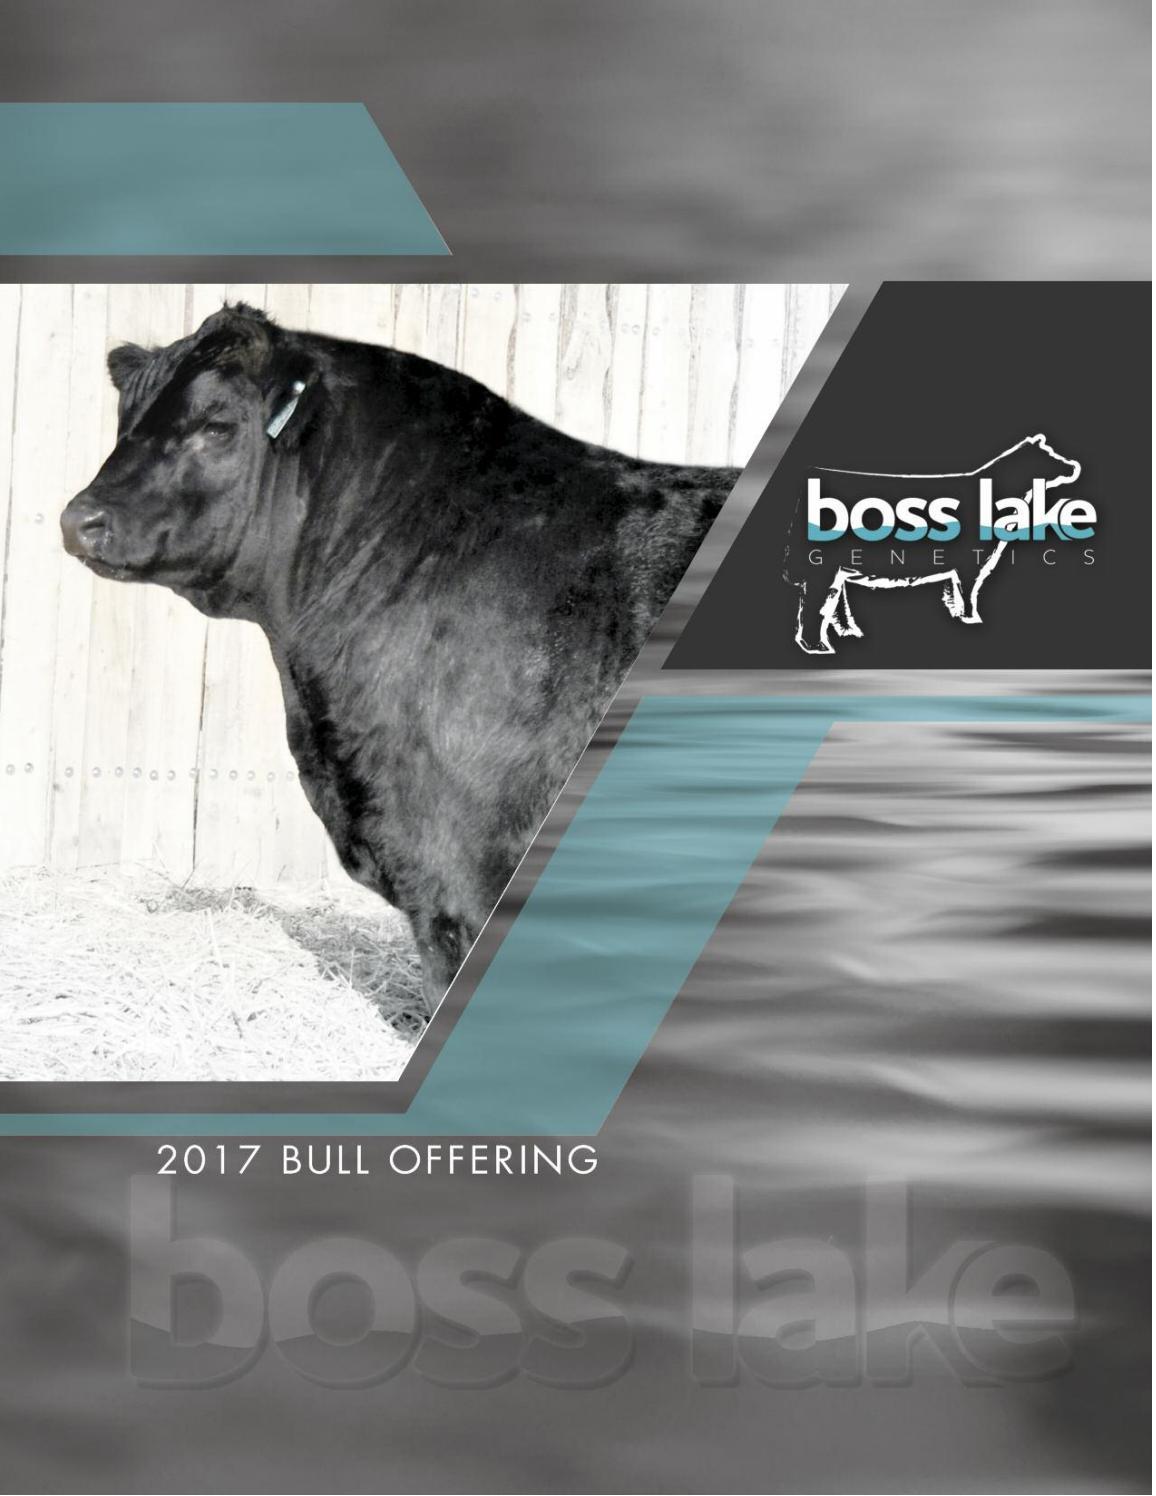 Boss Lake 2017 Private Treaty Bull Offering by Kim Matthews